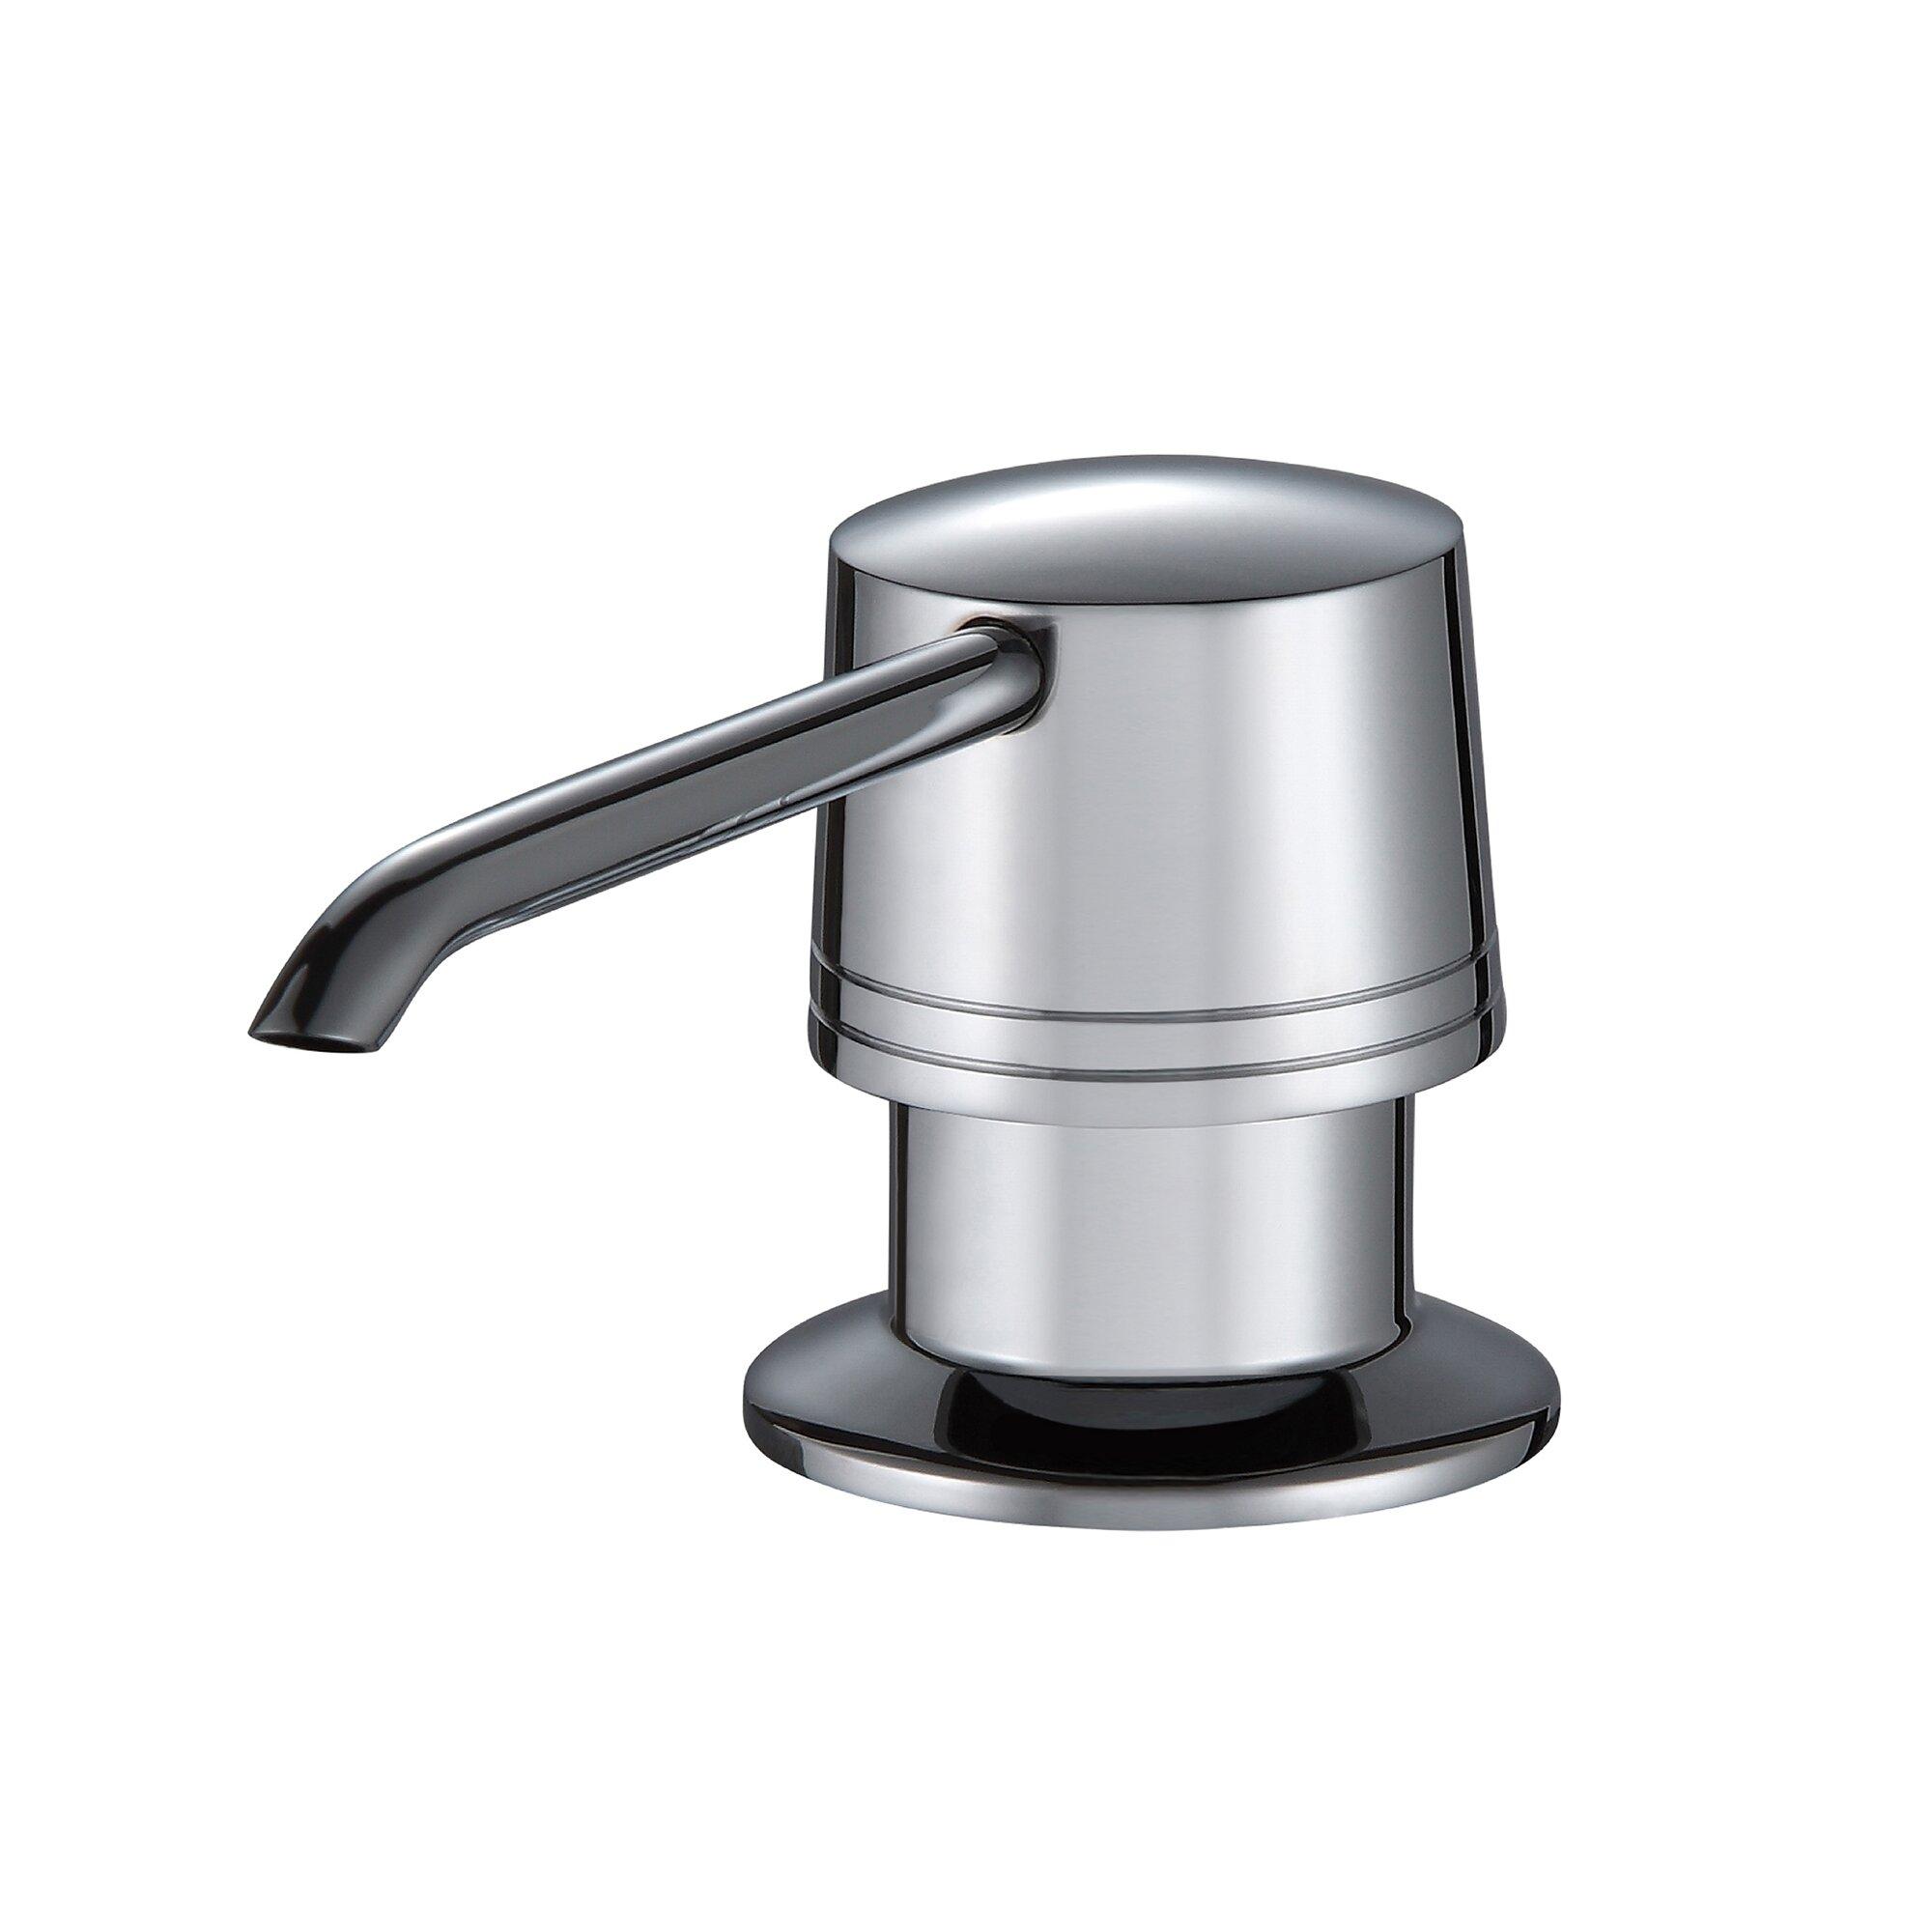 Kraus 30 X 18 Undermount Kitchen Sink With Faucet And Soap Dispenser Ii Reviews Wayfair